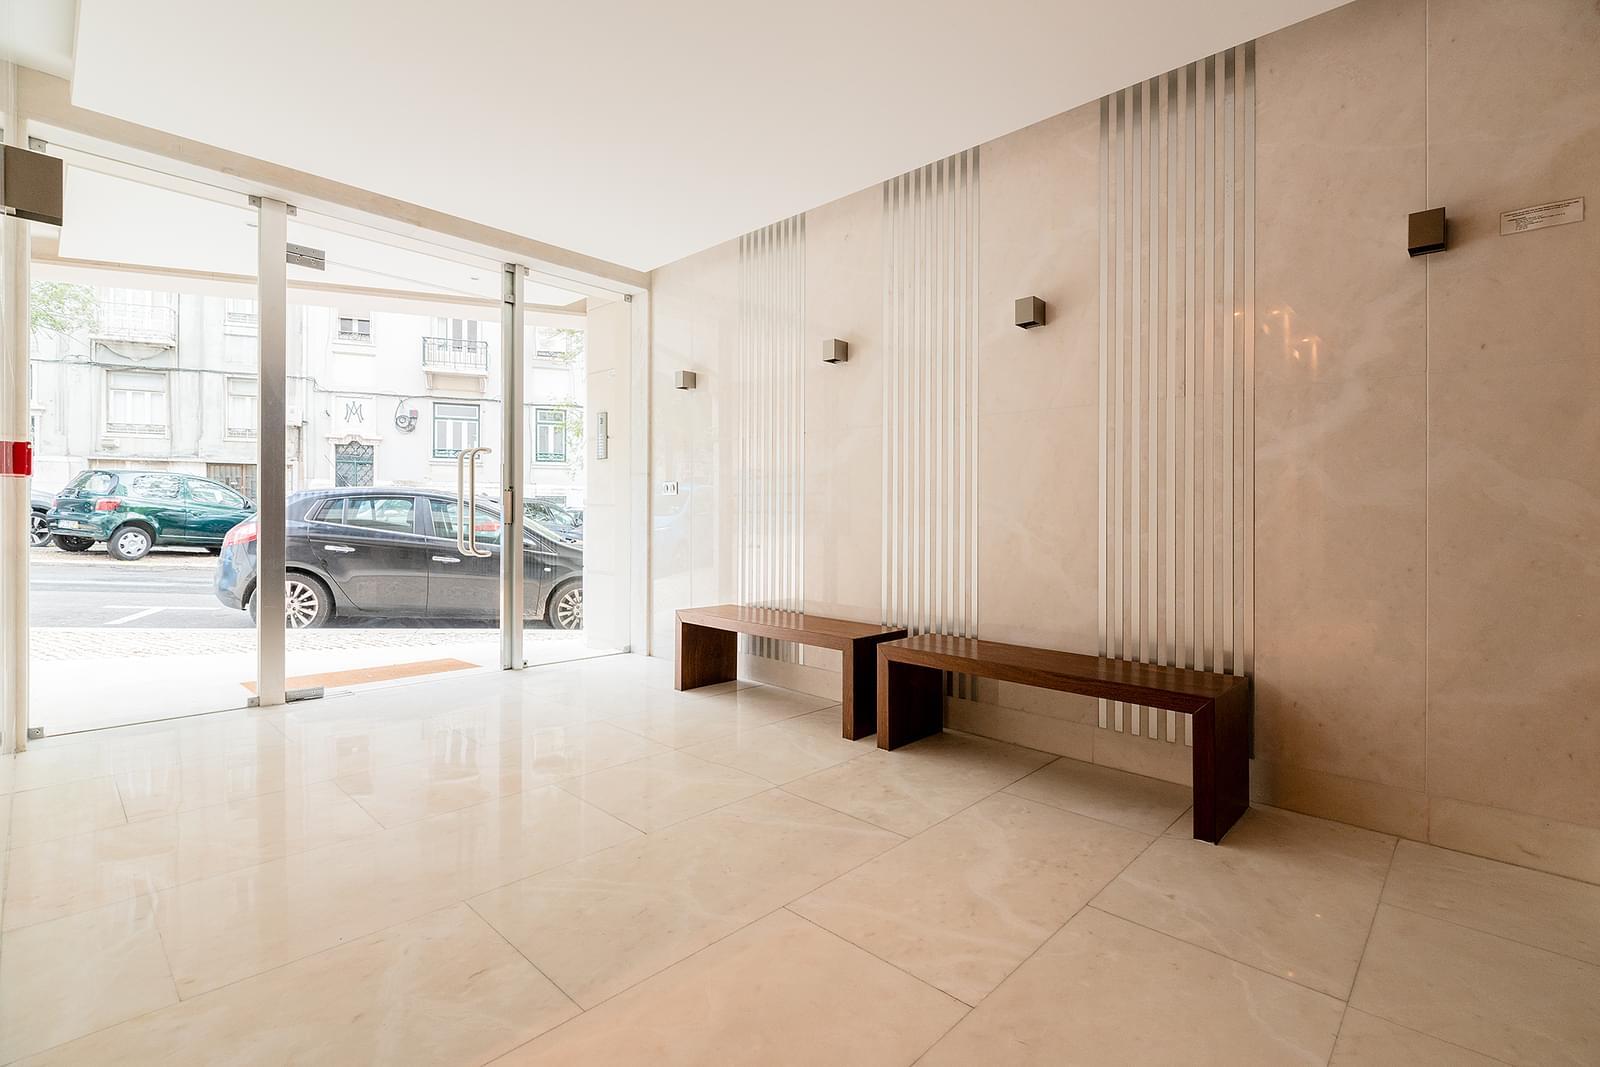 pf18533-apartamento-t4-lisboa-593eb6e3-5985-4fc5-9f7d-620c66715daf